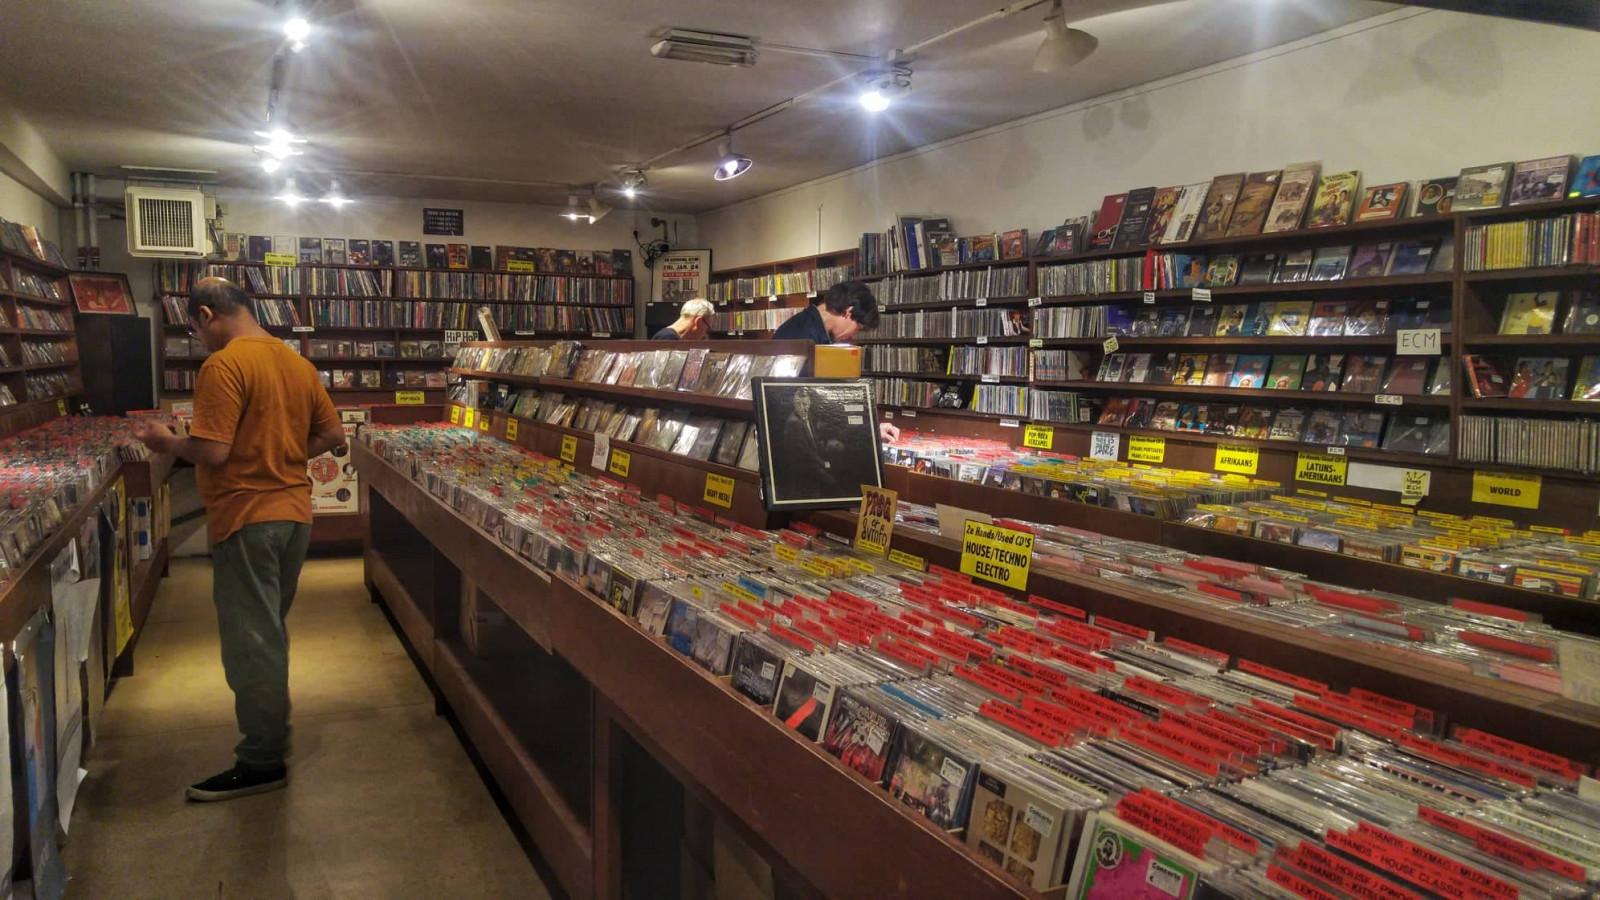 concerto-vinyl-records-in-amsterdam-store